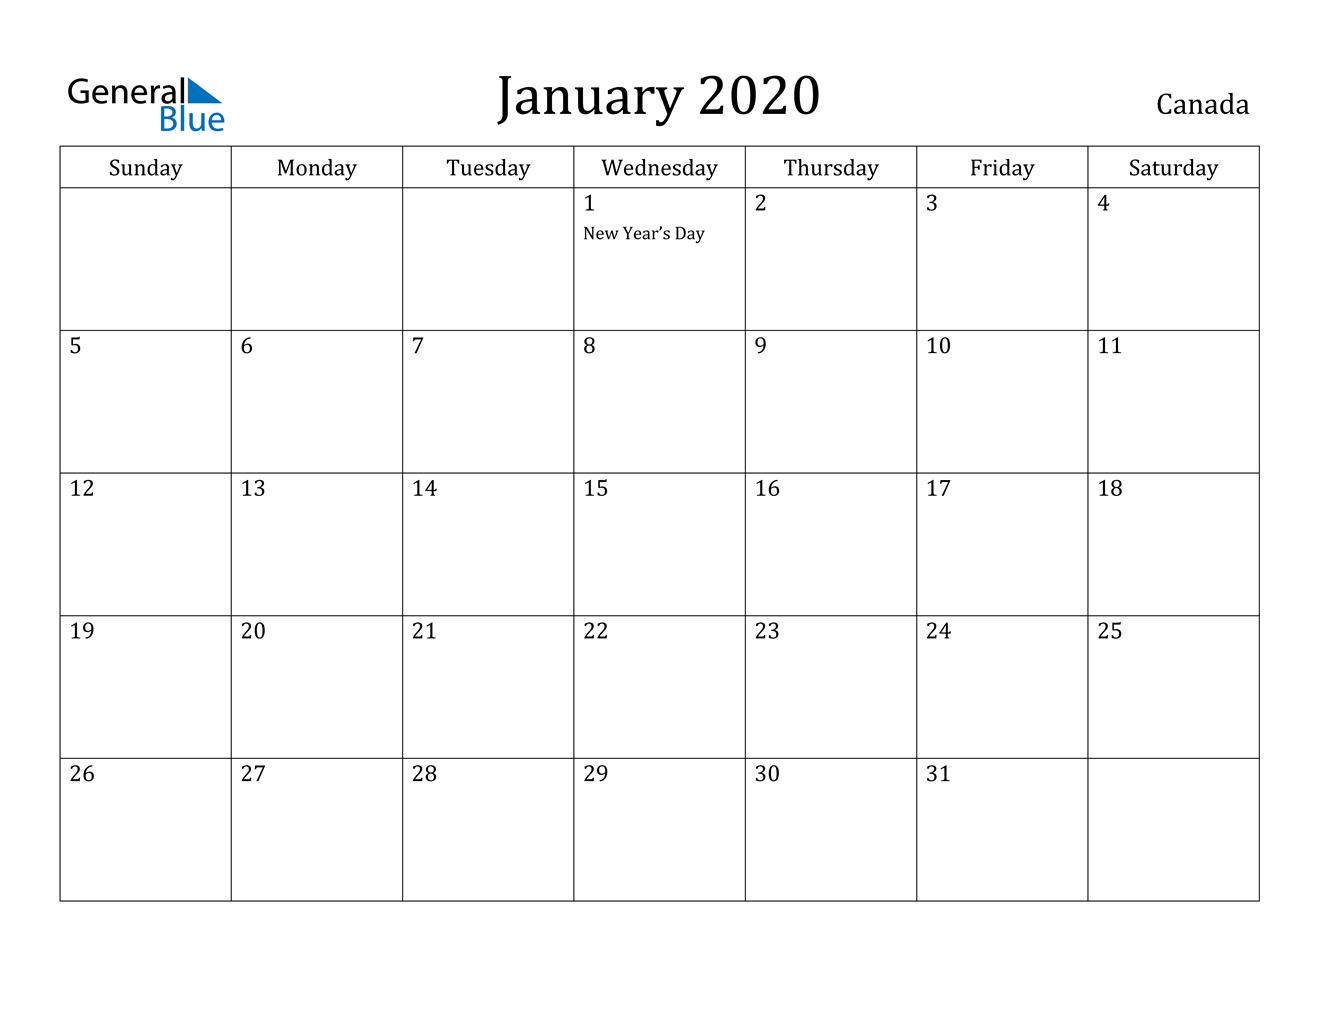 January 2020 Calendar - Canada